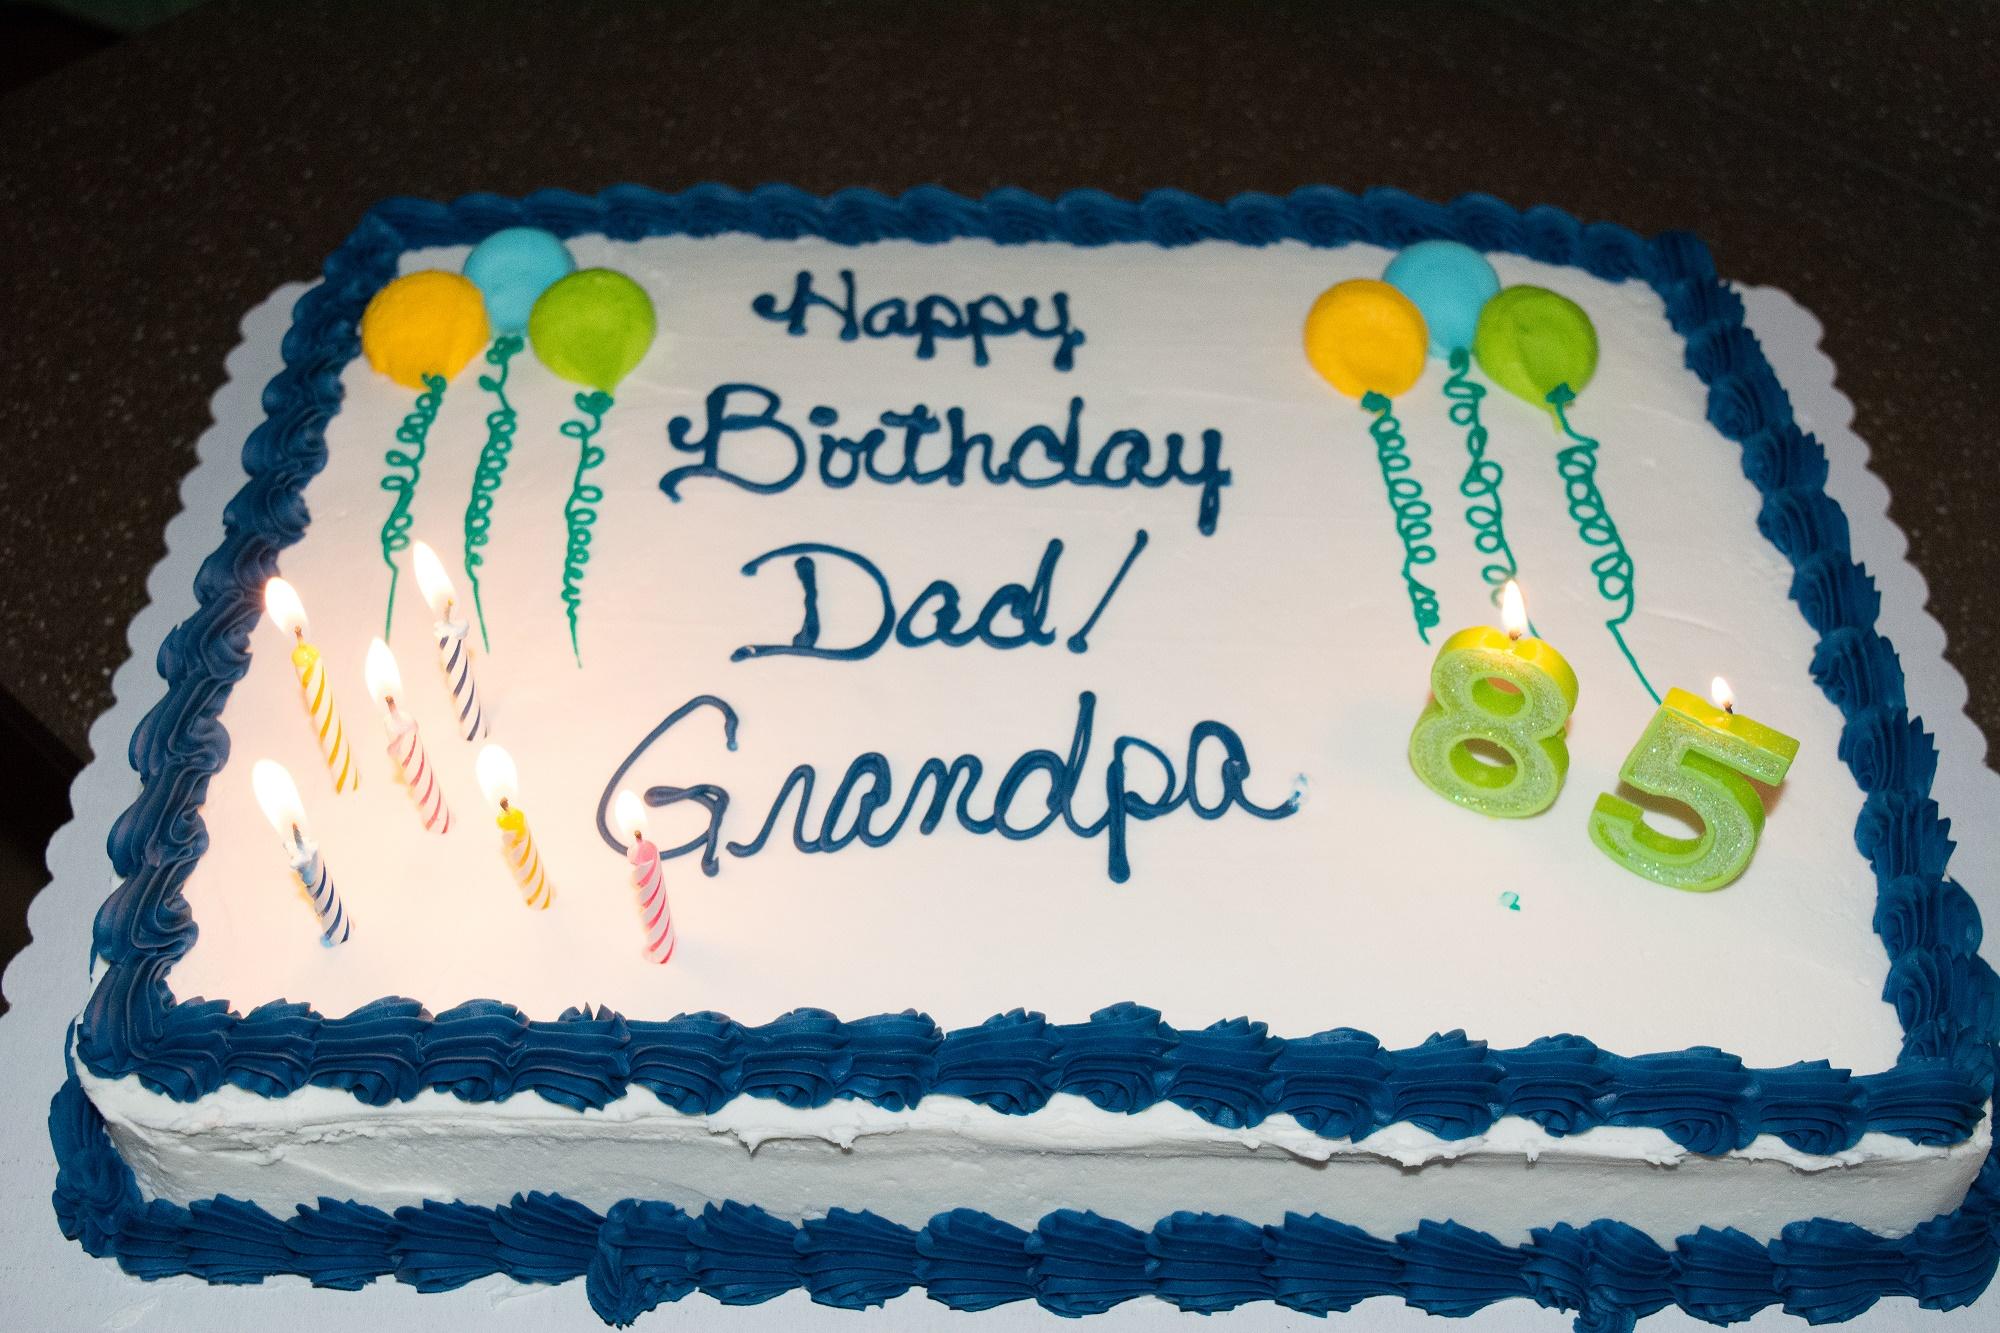 Grandpa's 85th Birthday Party-11.jpg